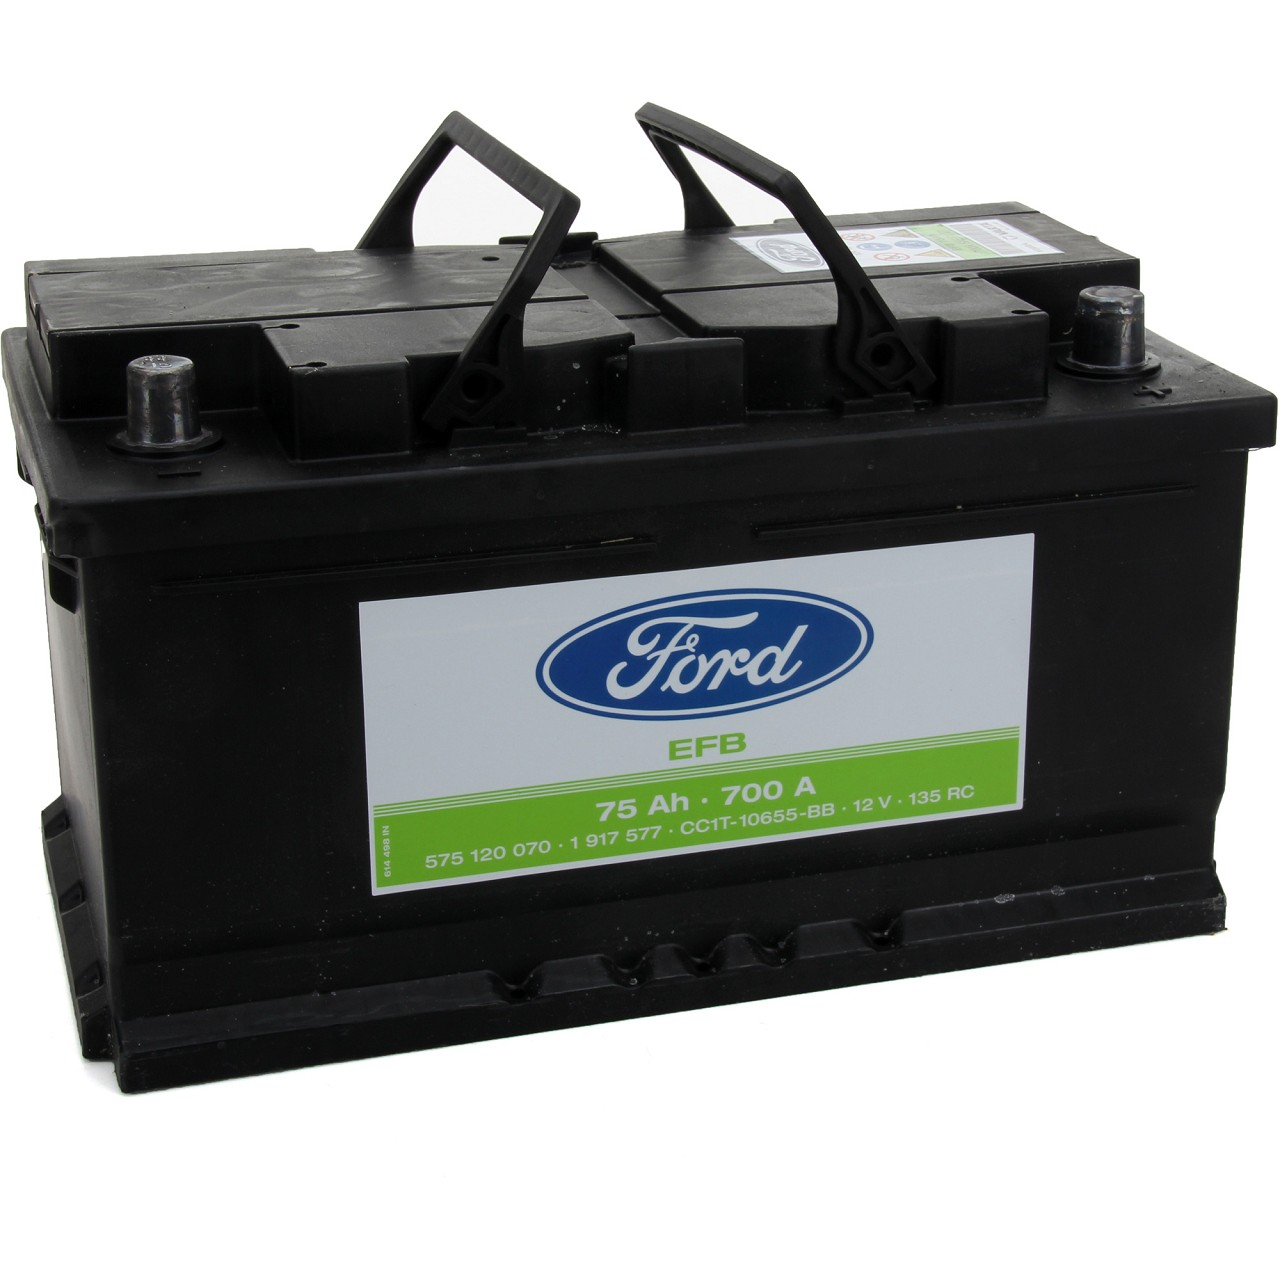 ORIGINAL Ford Autobatterie Batterie Starterbatterie 12V 75Ah 700A 1917577